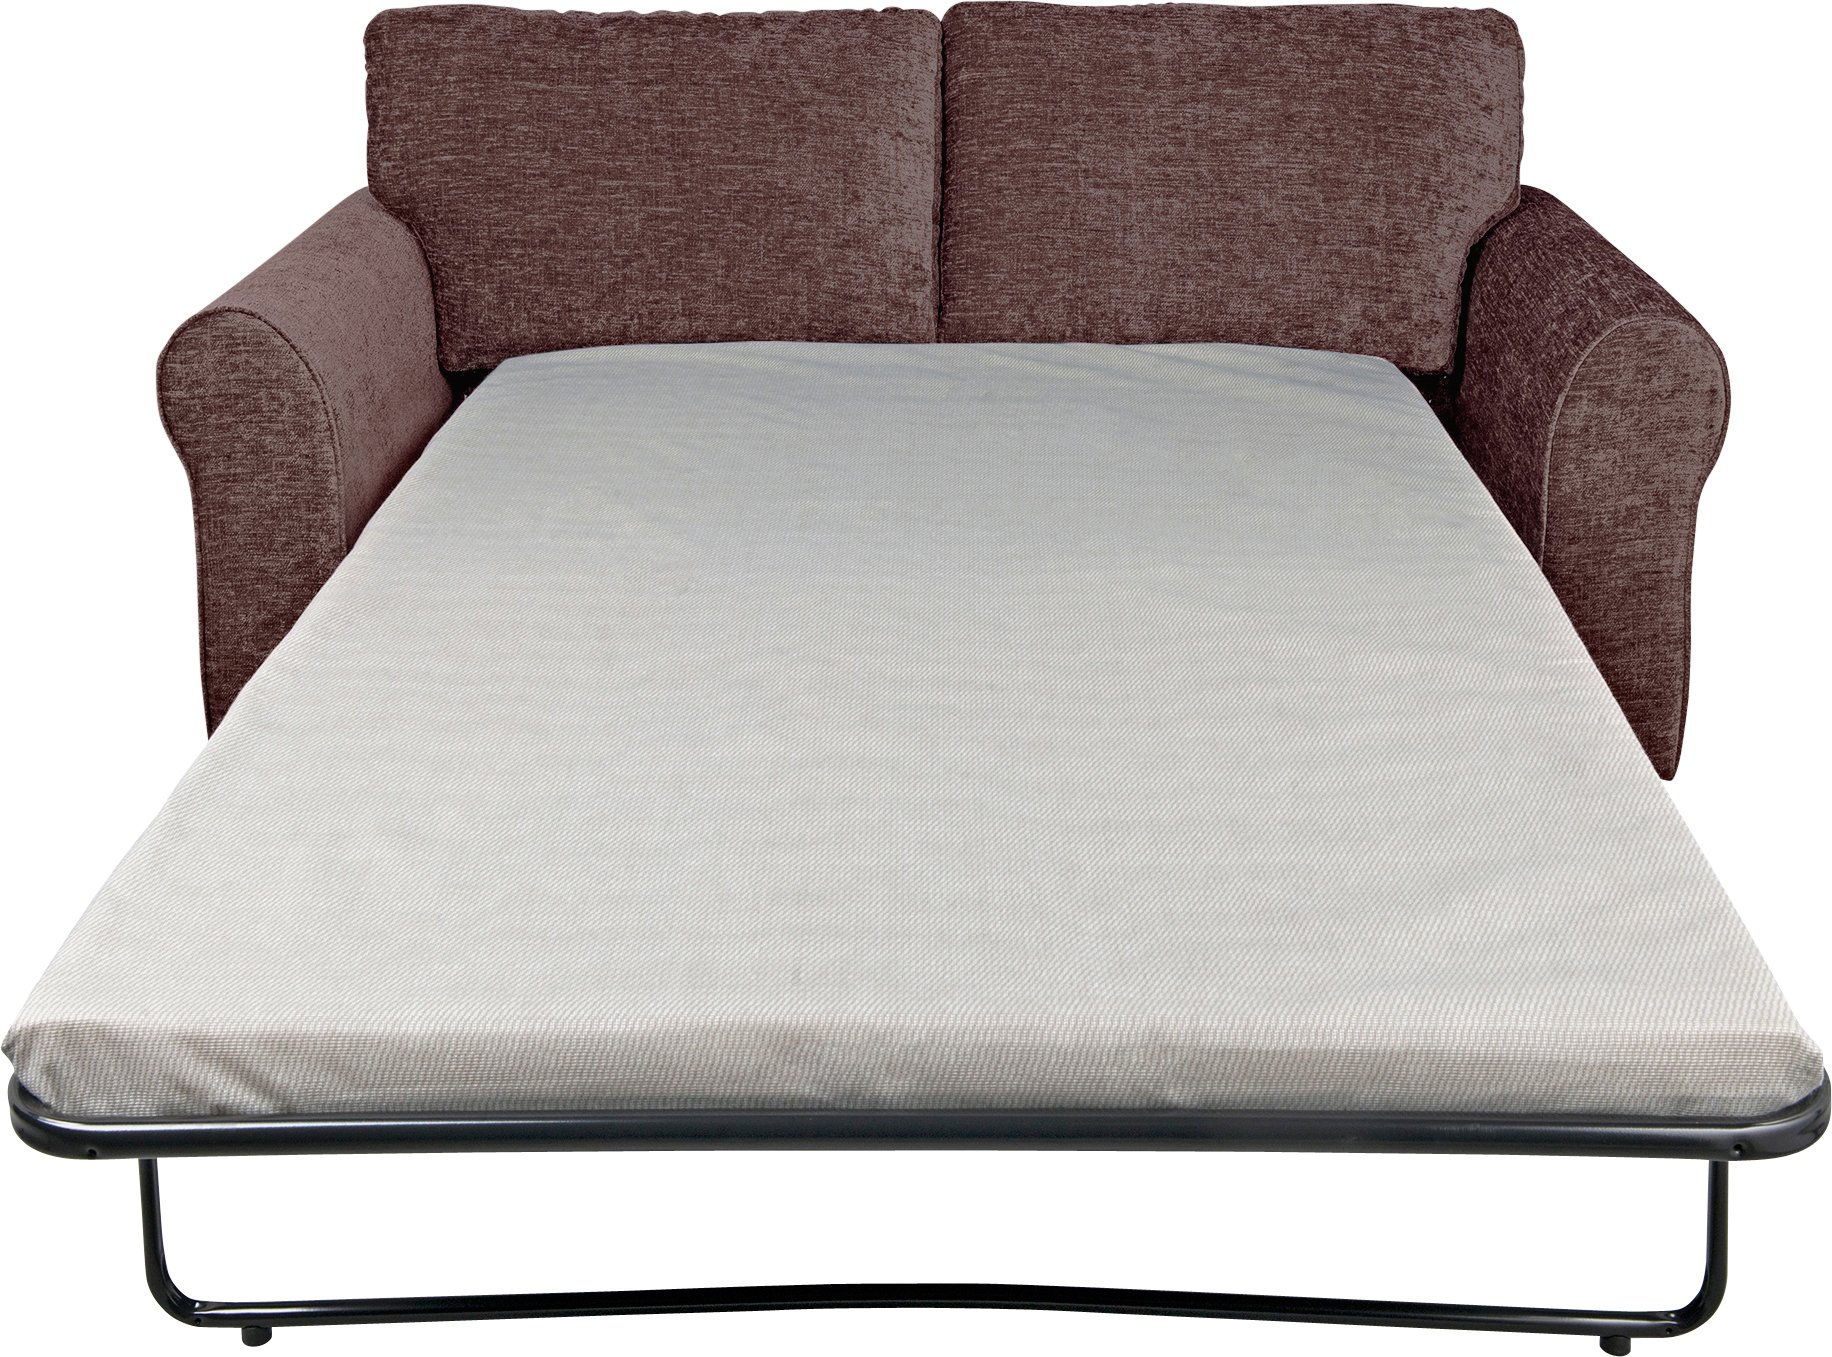 cheap fabric sofa singapore furniture manhattan rolled arm argos fold up bed | baci living room